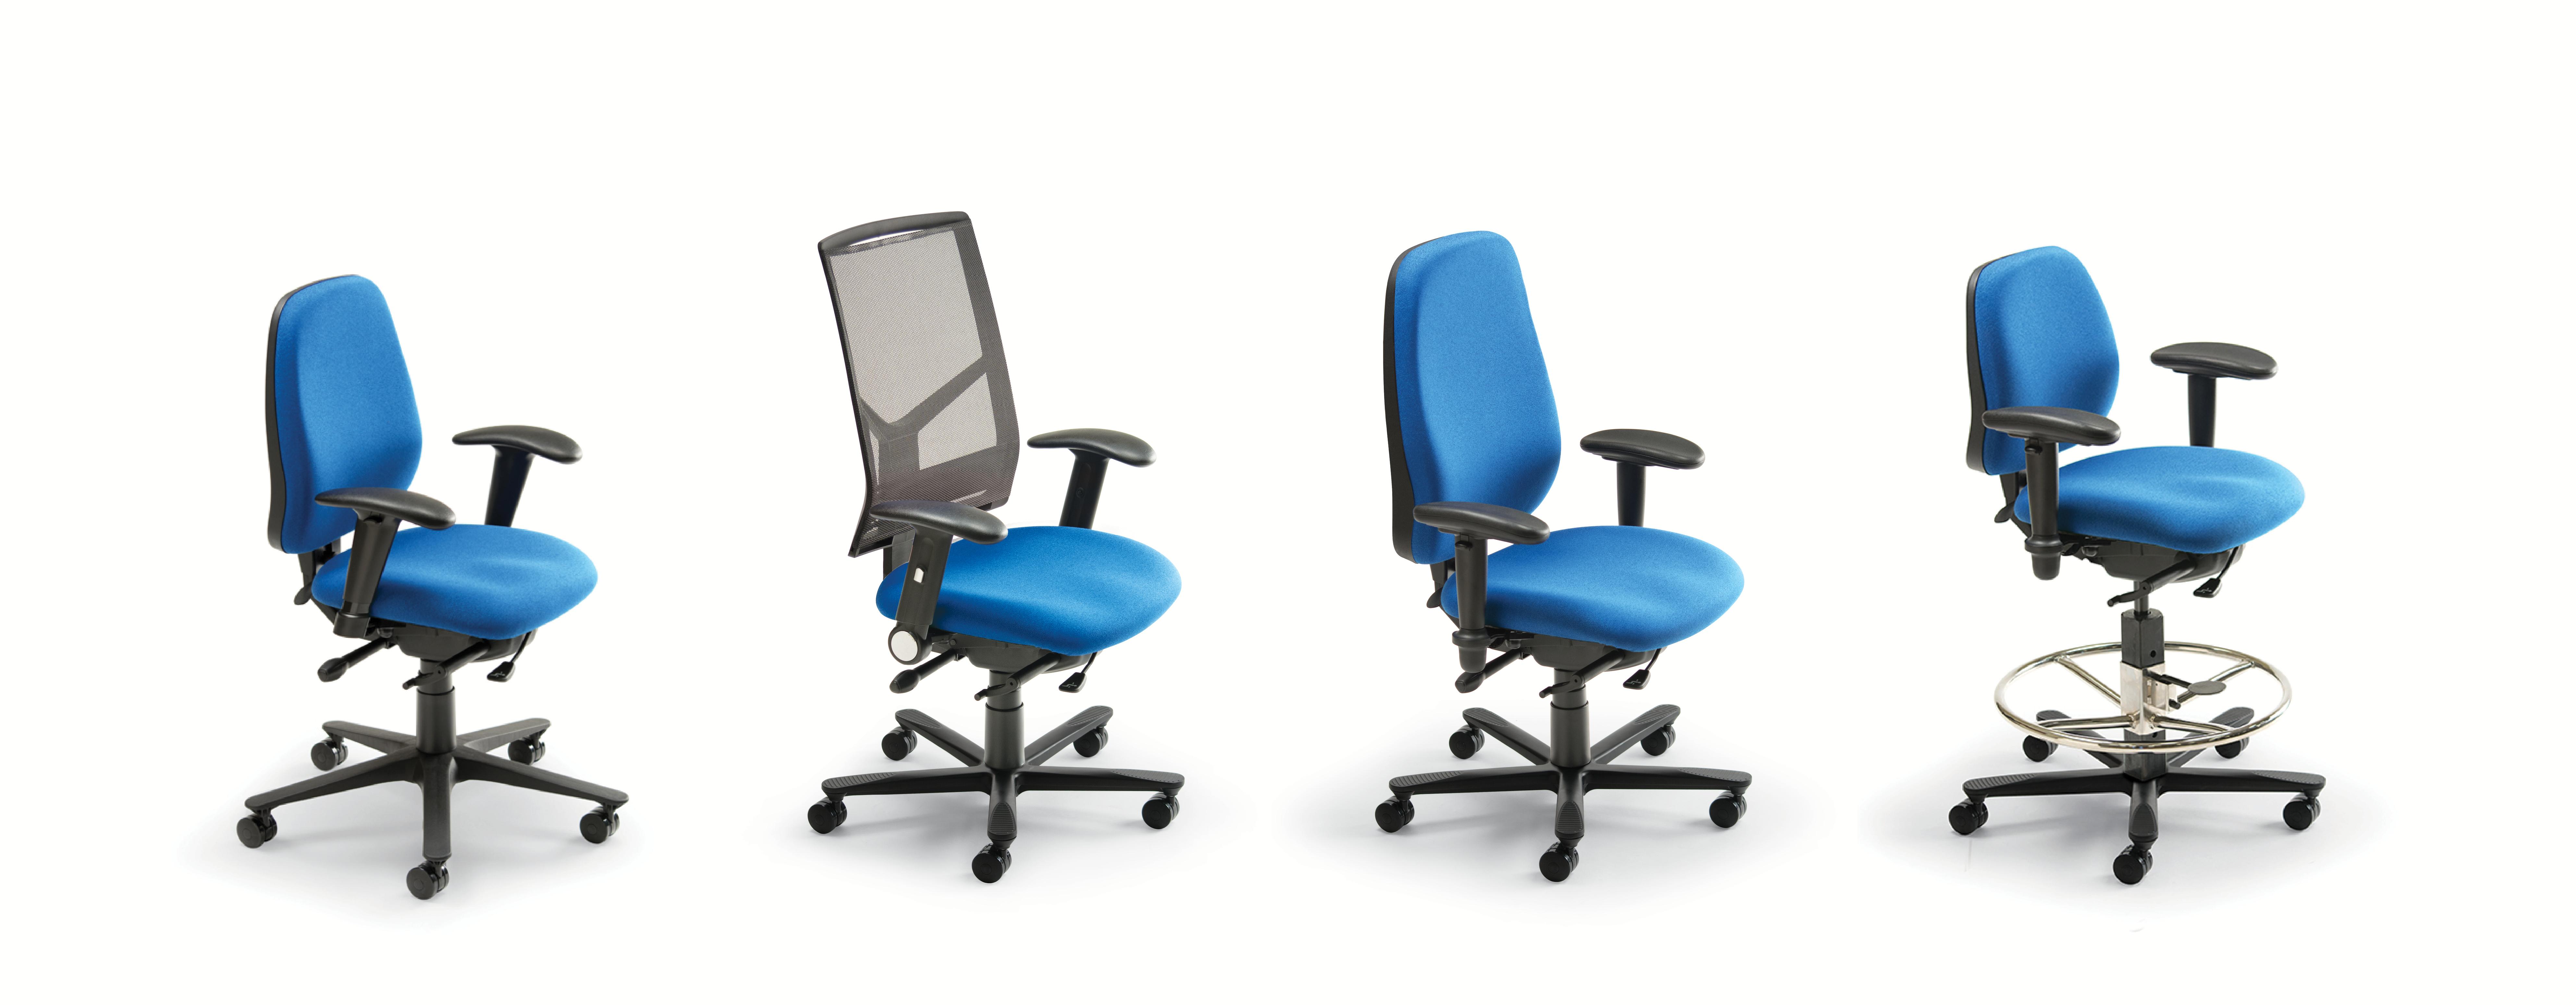 Strange Sitmatic Com Machost Co Dining Chair Design Ideas Machostcouk